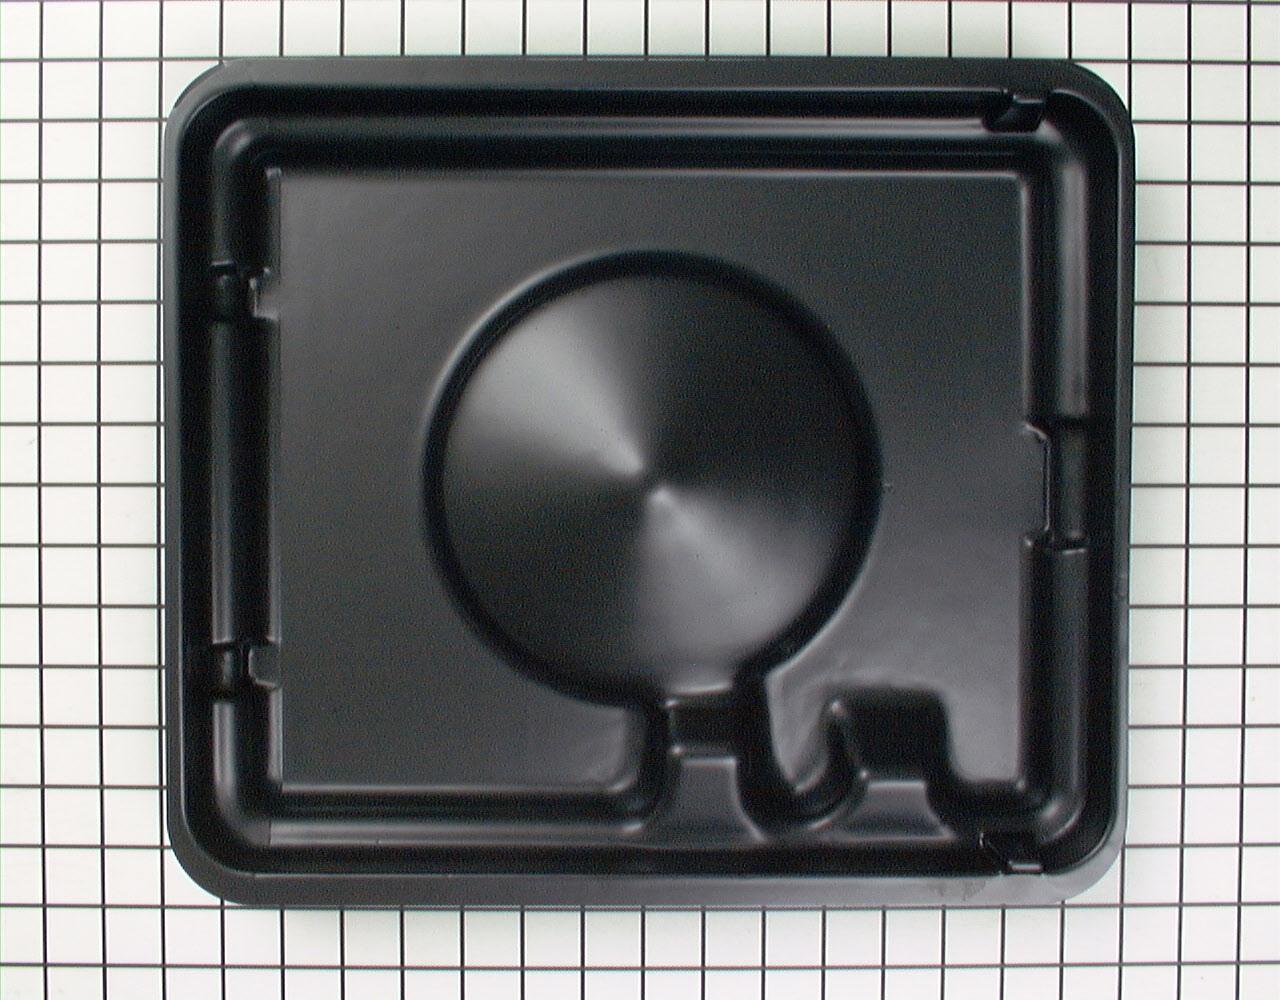 WP68236-1 Montgomery Wards Refrigerator Part -Drip Tray